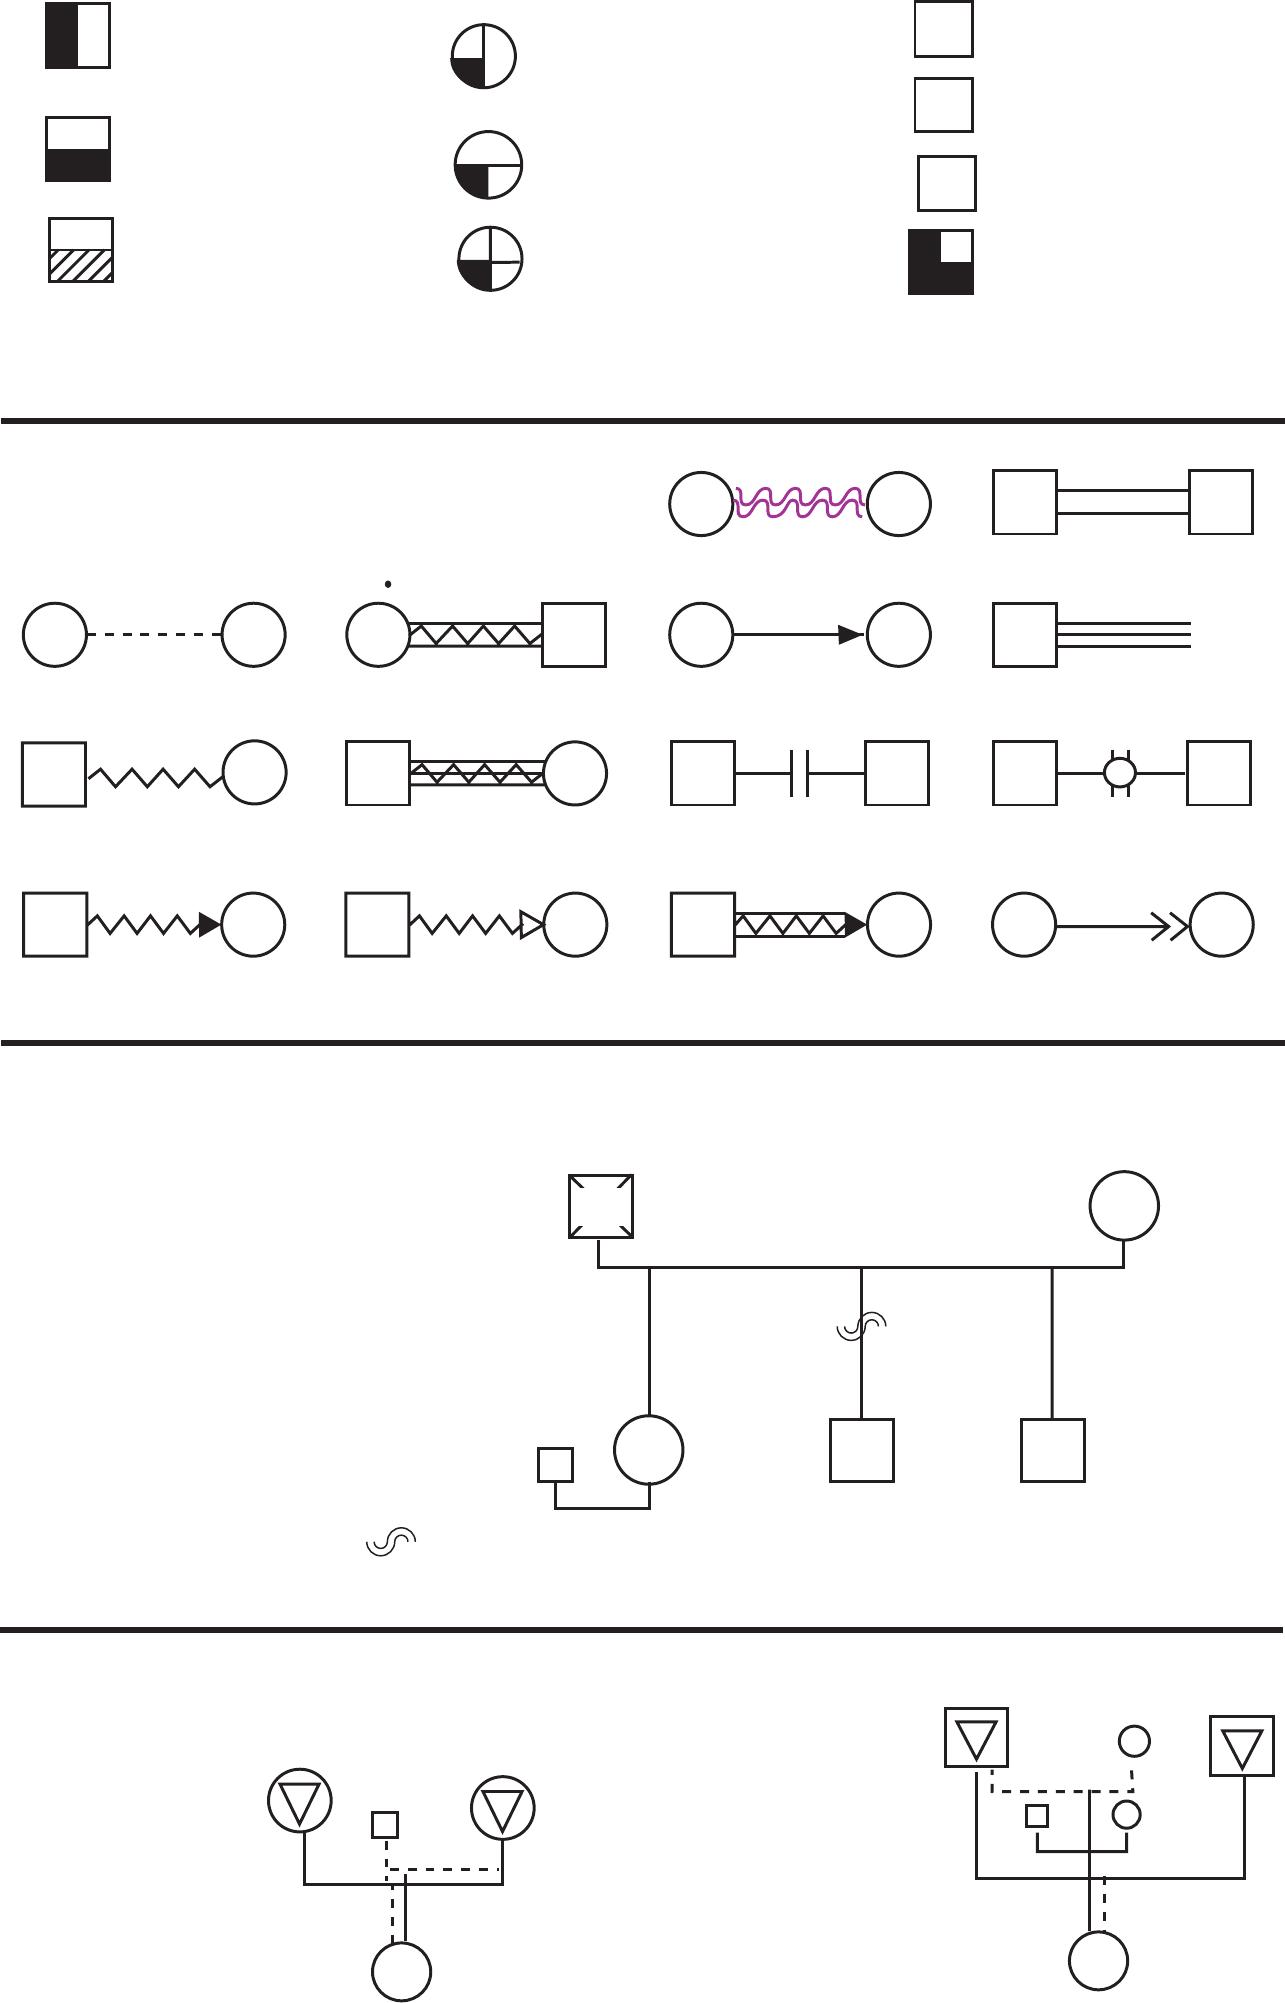 Standard Genogram Symbols Template